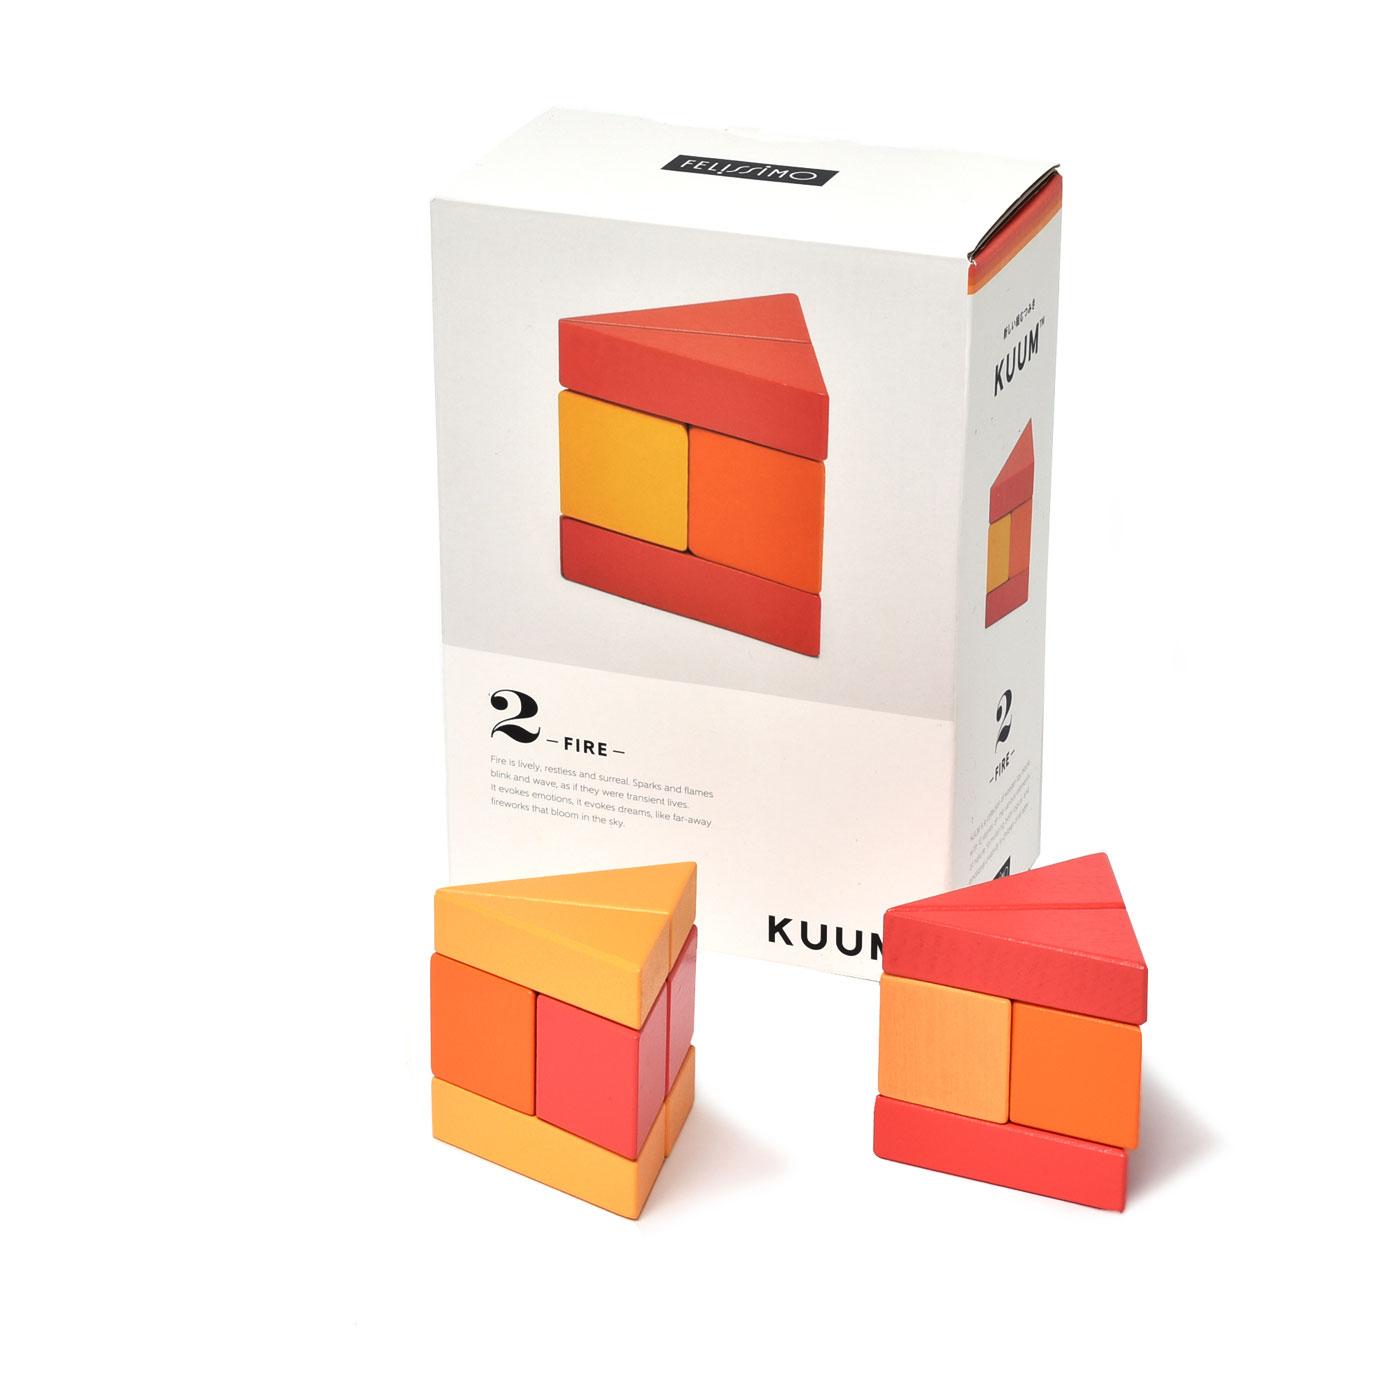 02 Fire (orange)